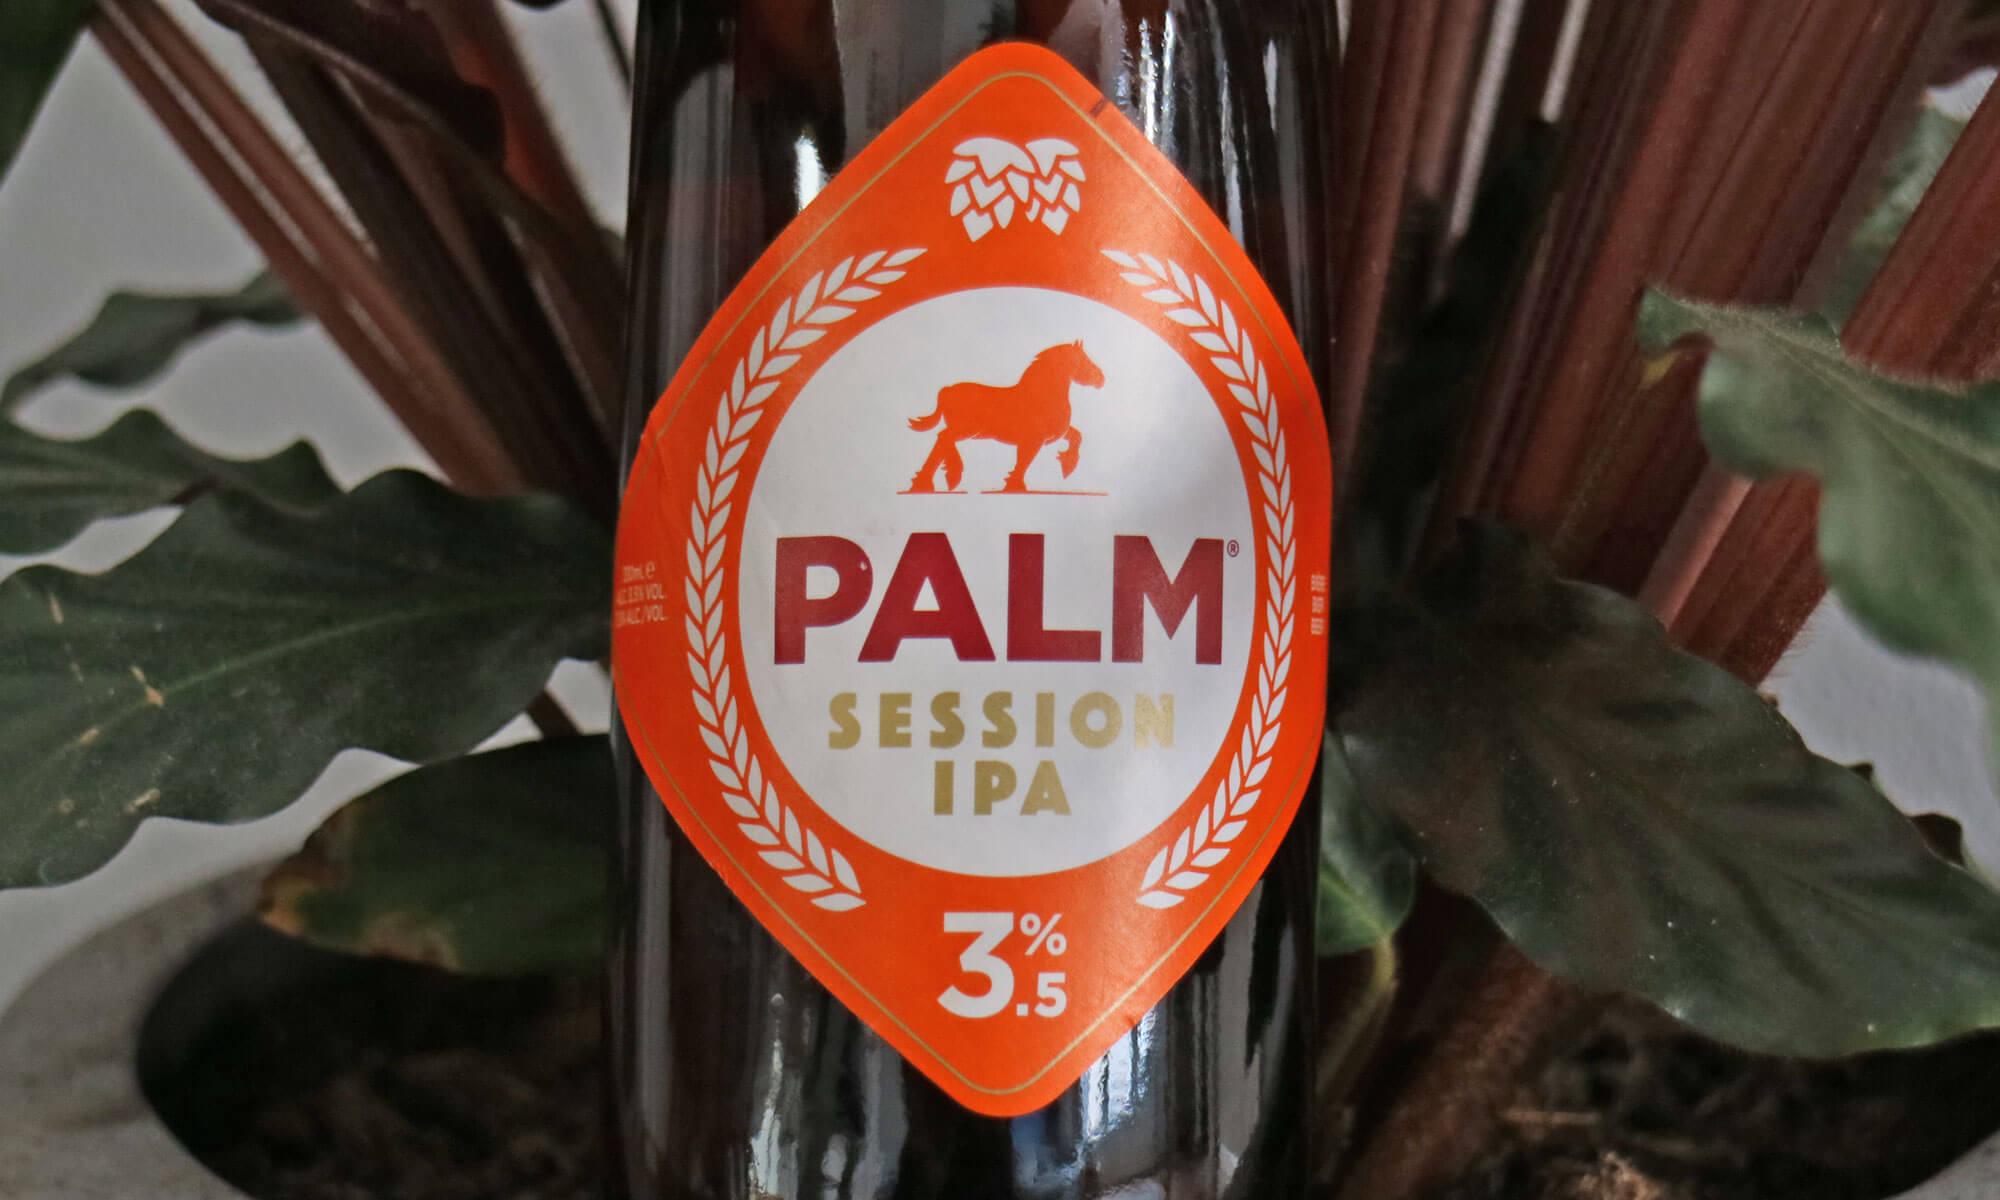 Palm - Session IPA